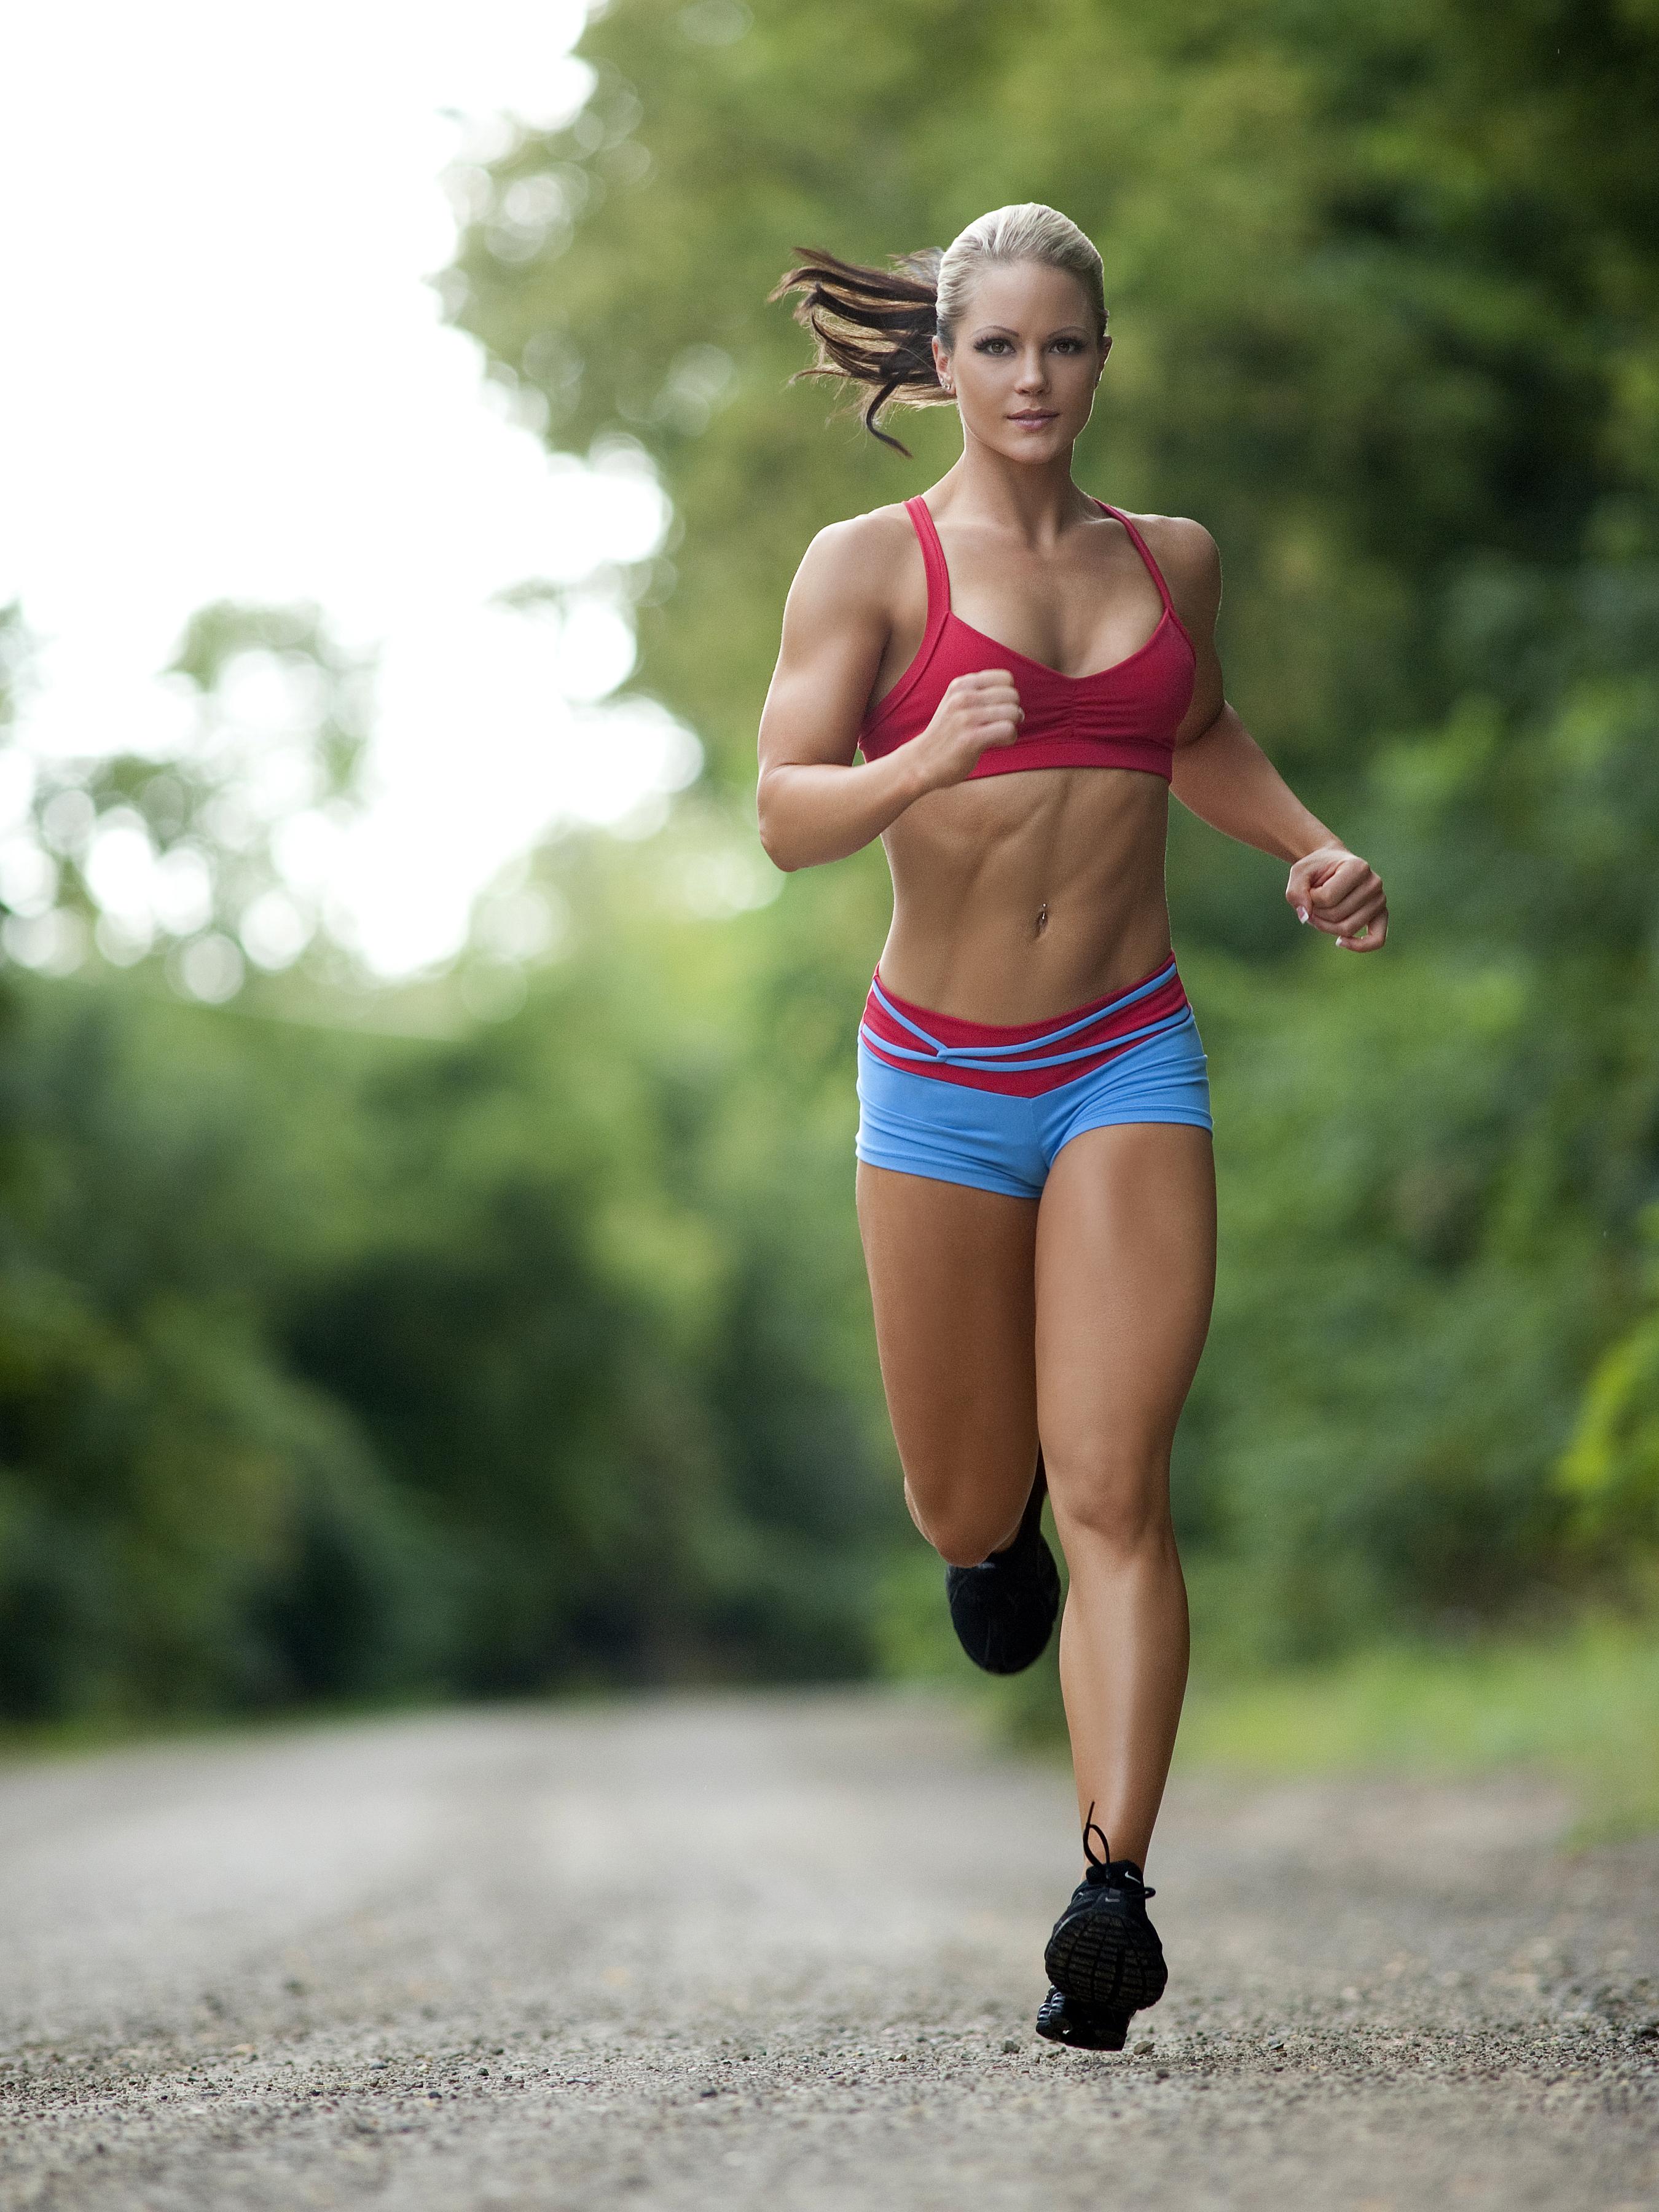 Nicole Wilkins - Nicole-Wilkins-Autographed-Running-Photo -9286